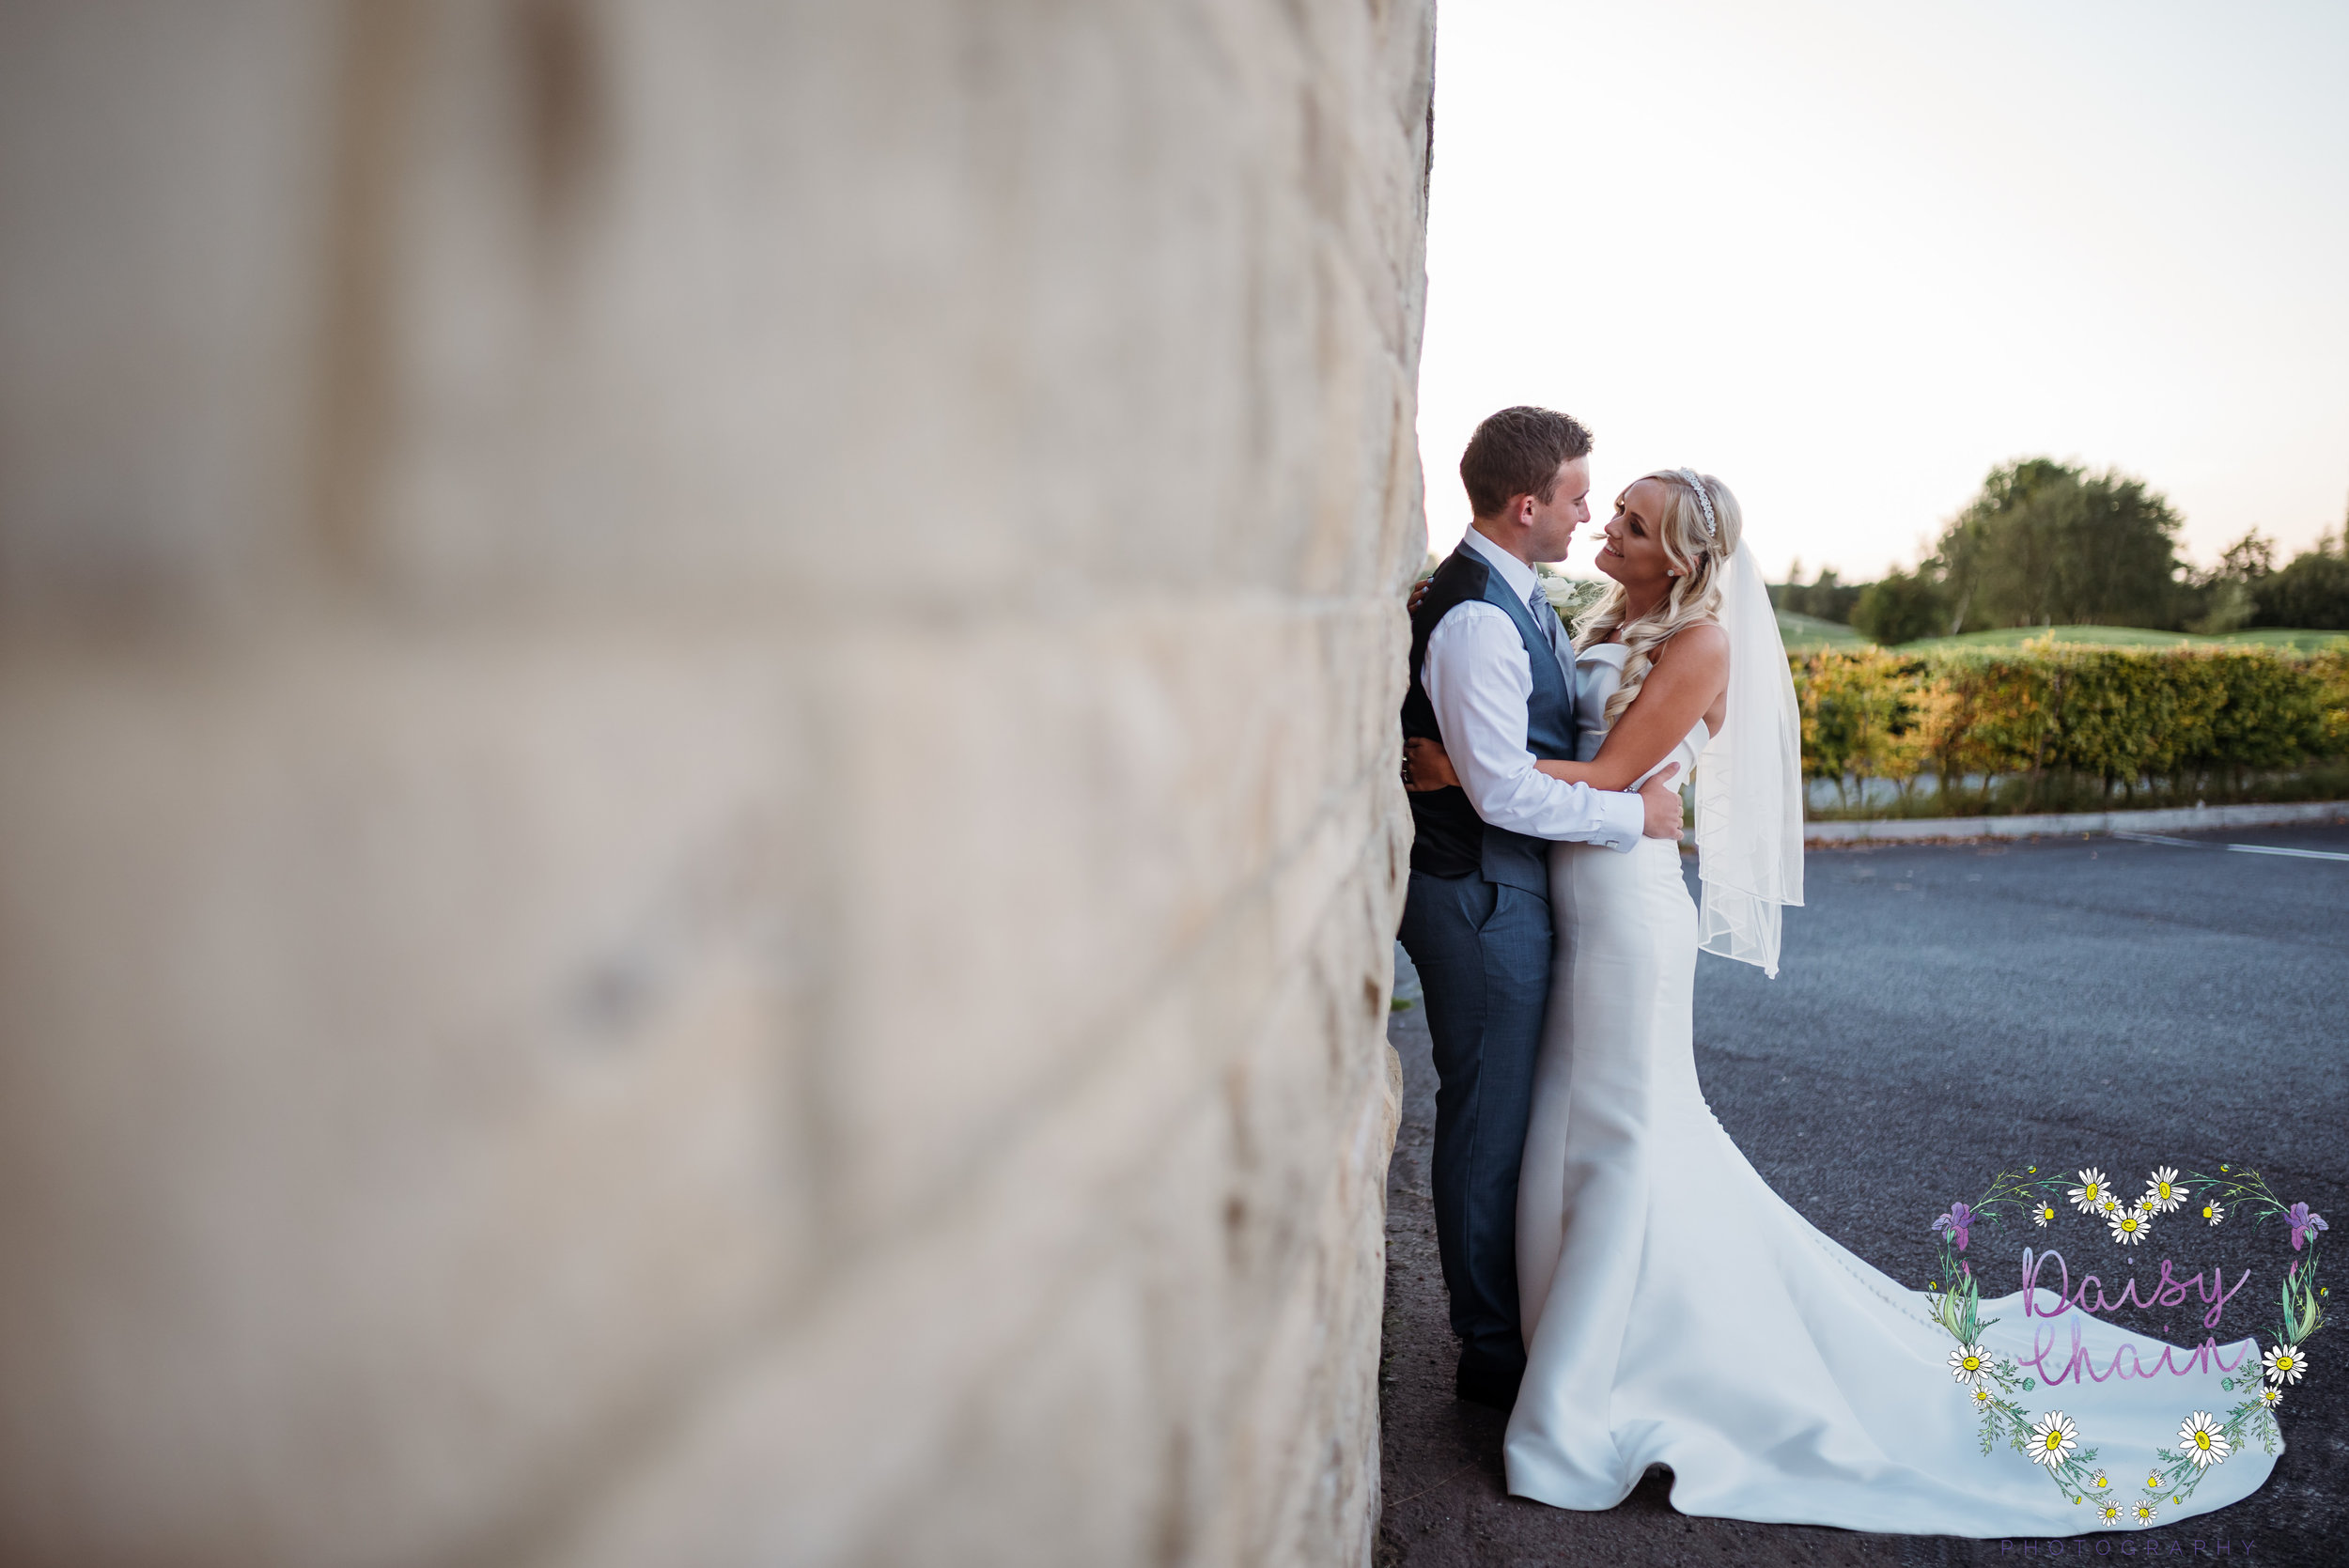 Merseyside wedding photographer - Hurlston Hall